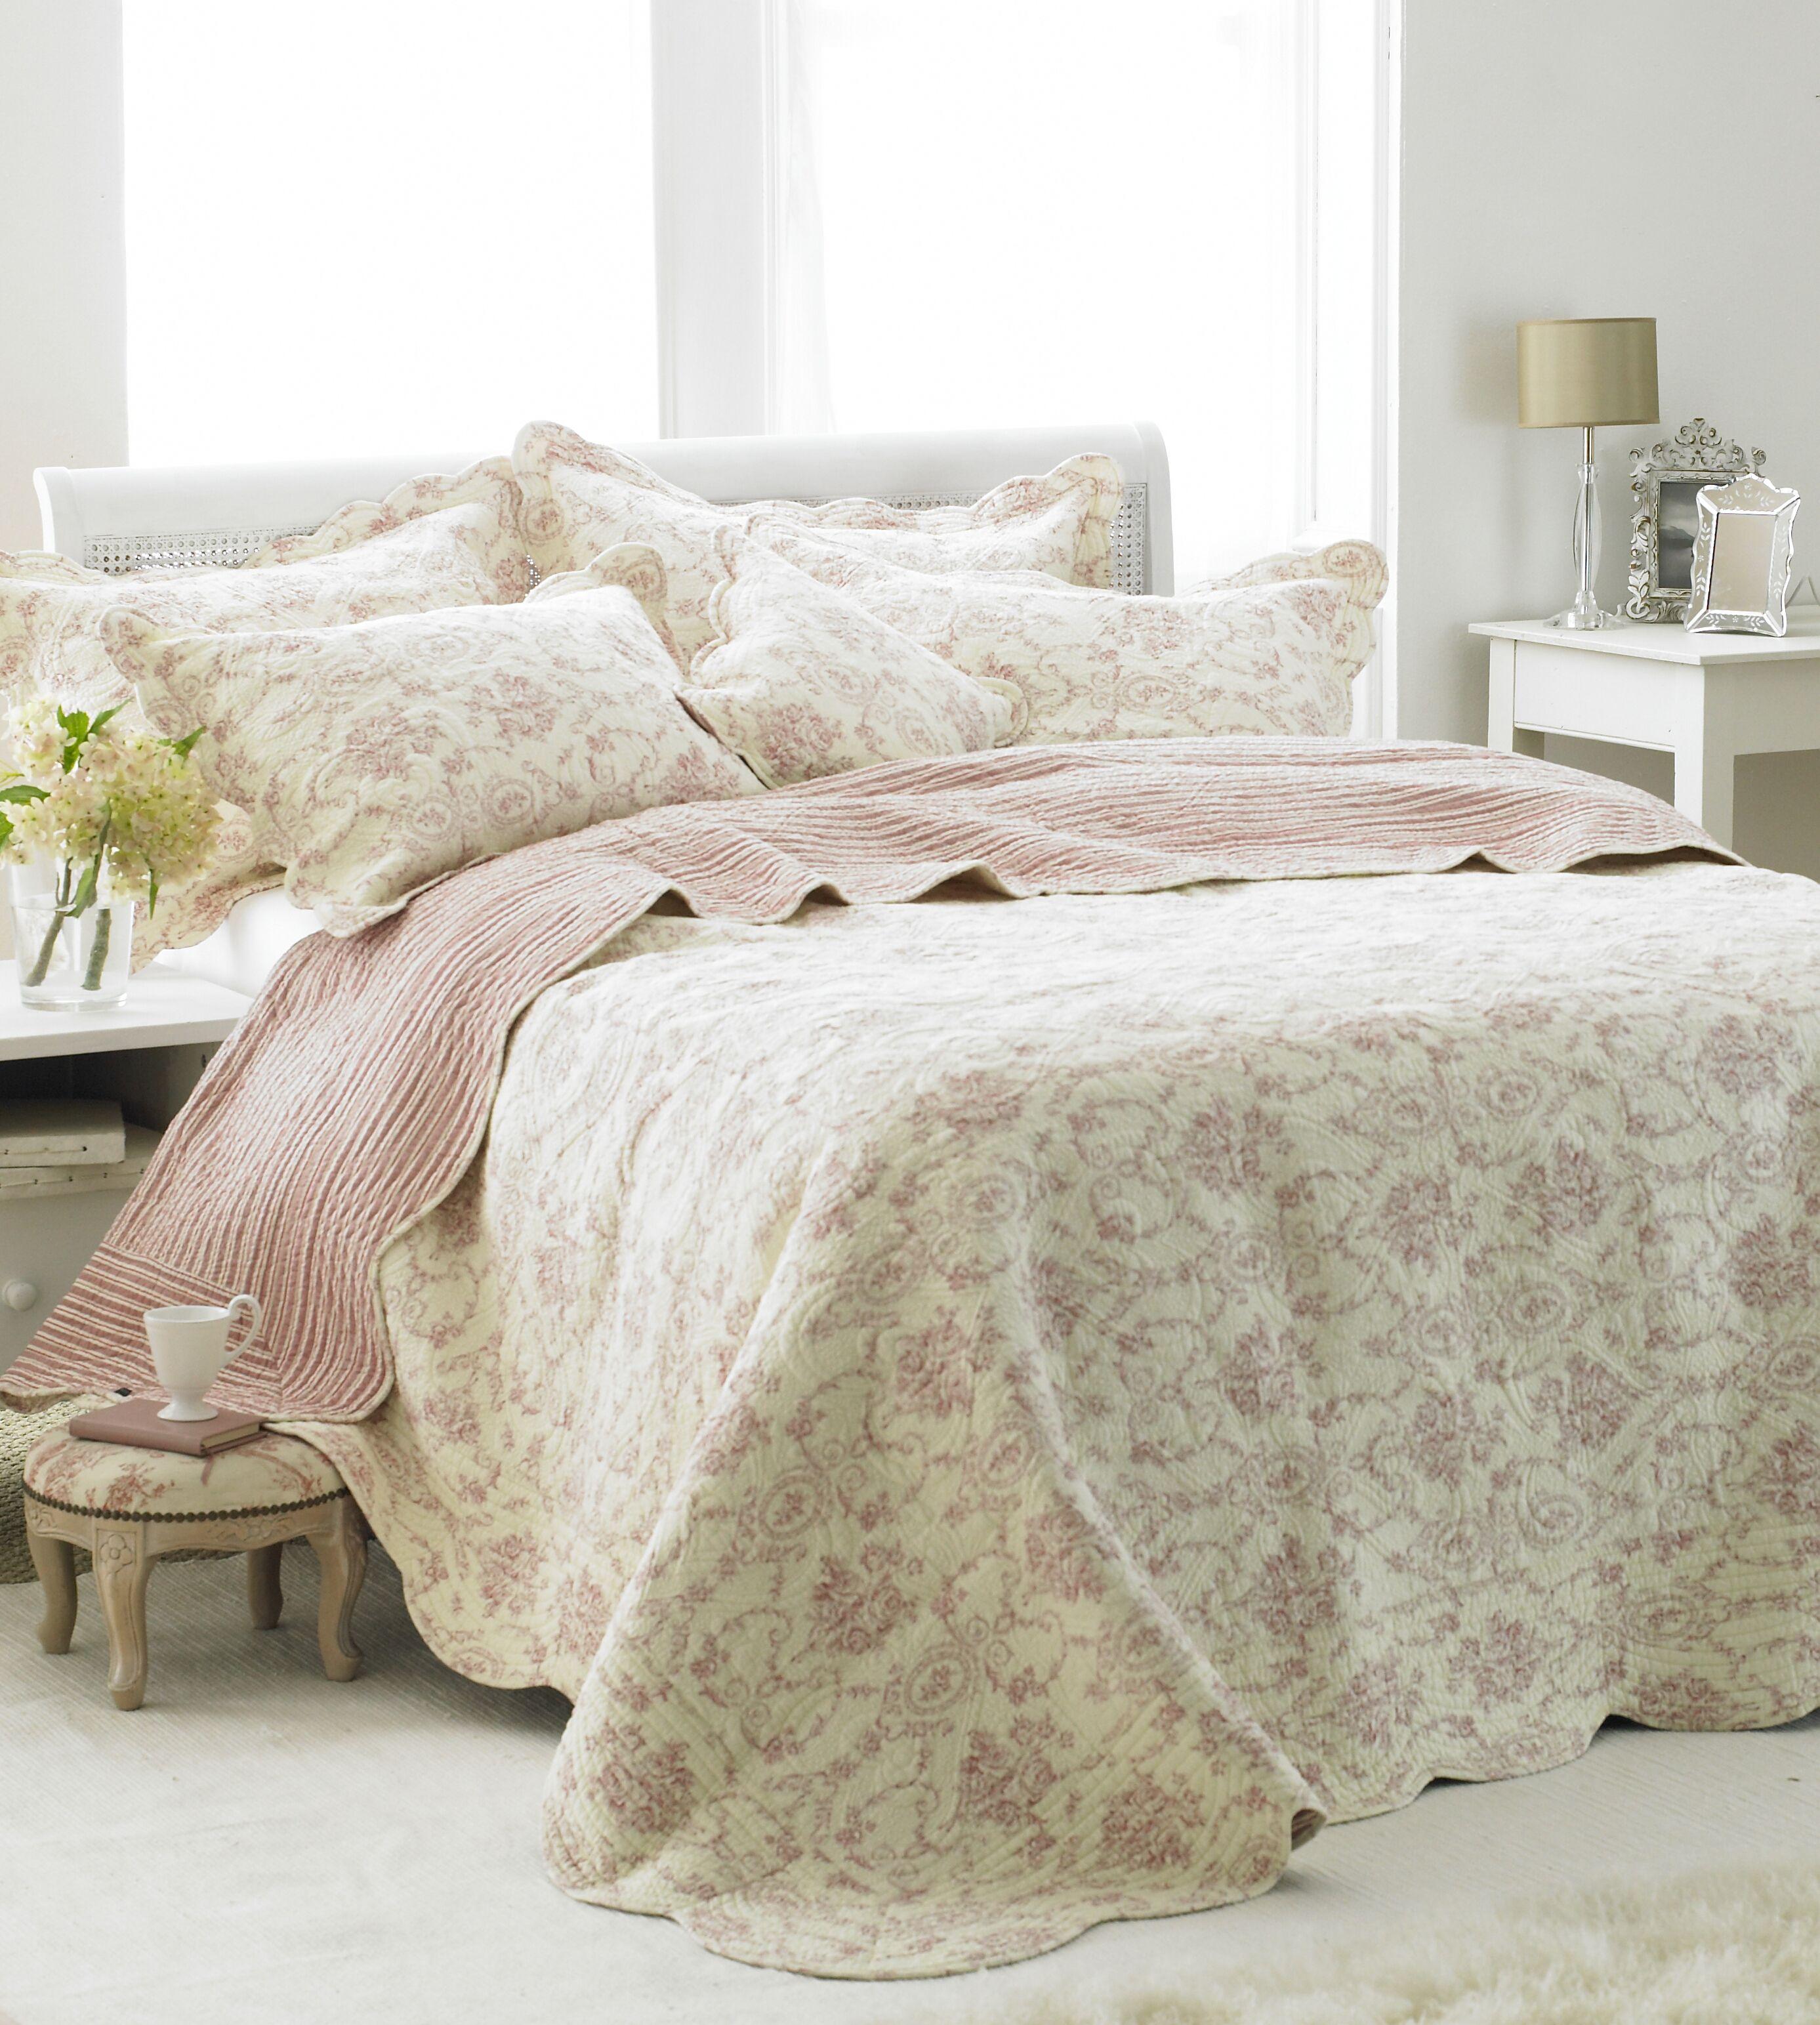 Etoille King Bedspread Pink